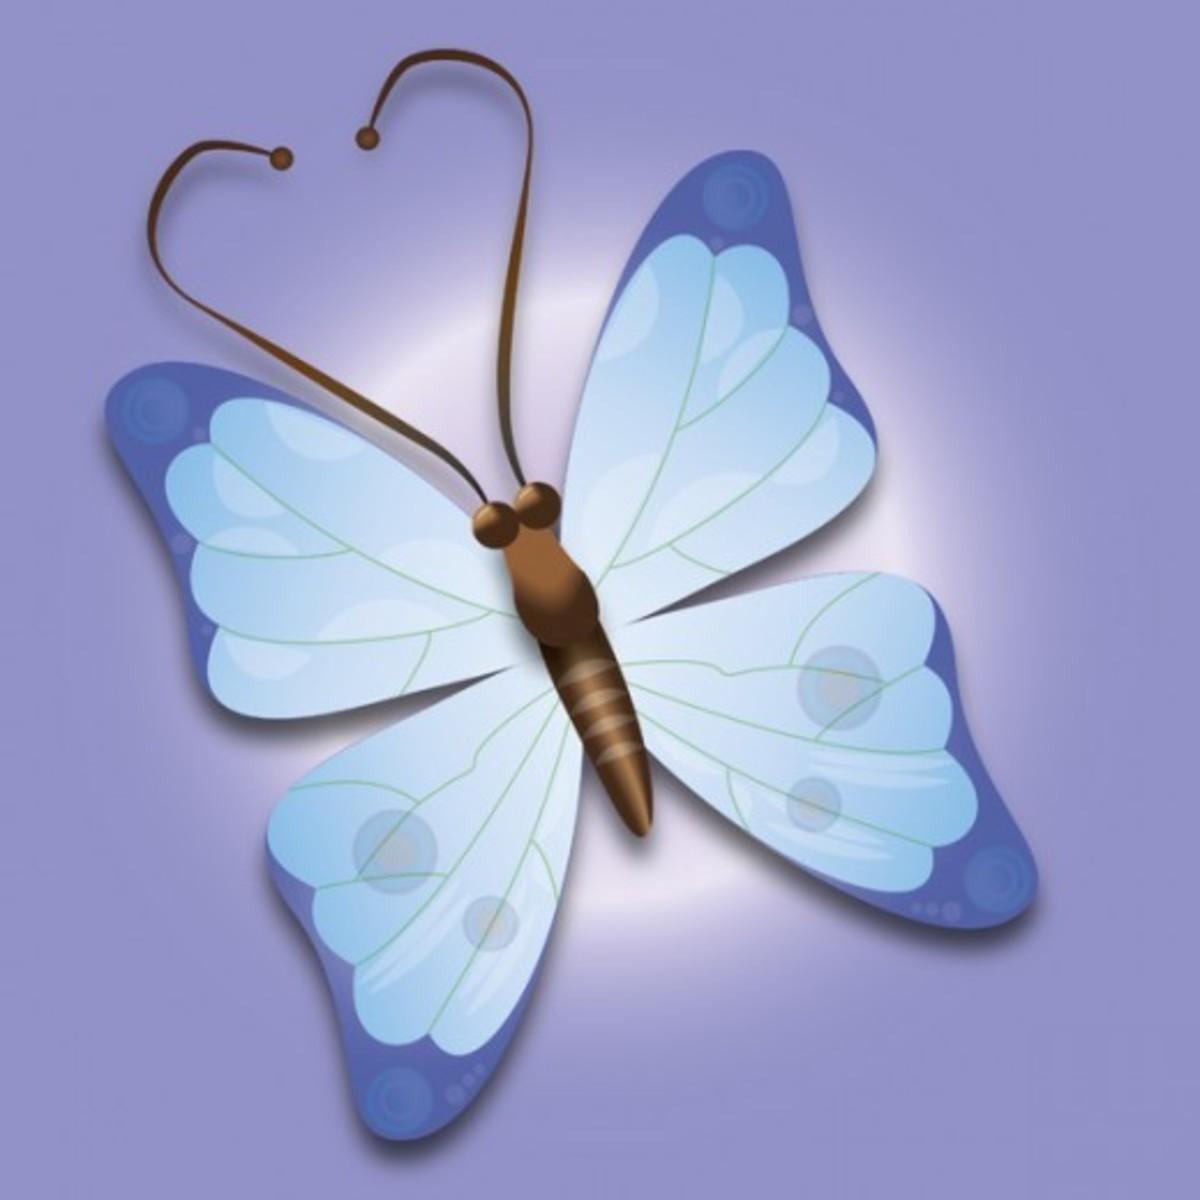 Blue Butterfly on Purple Background